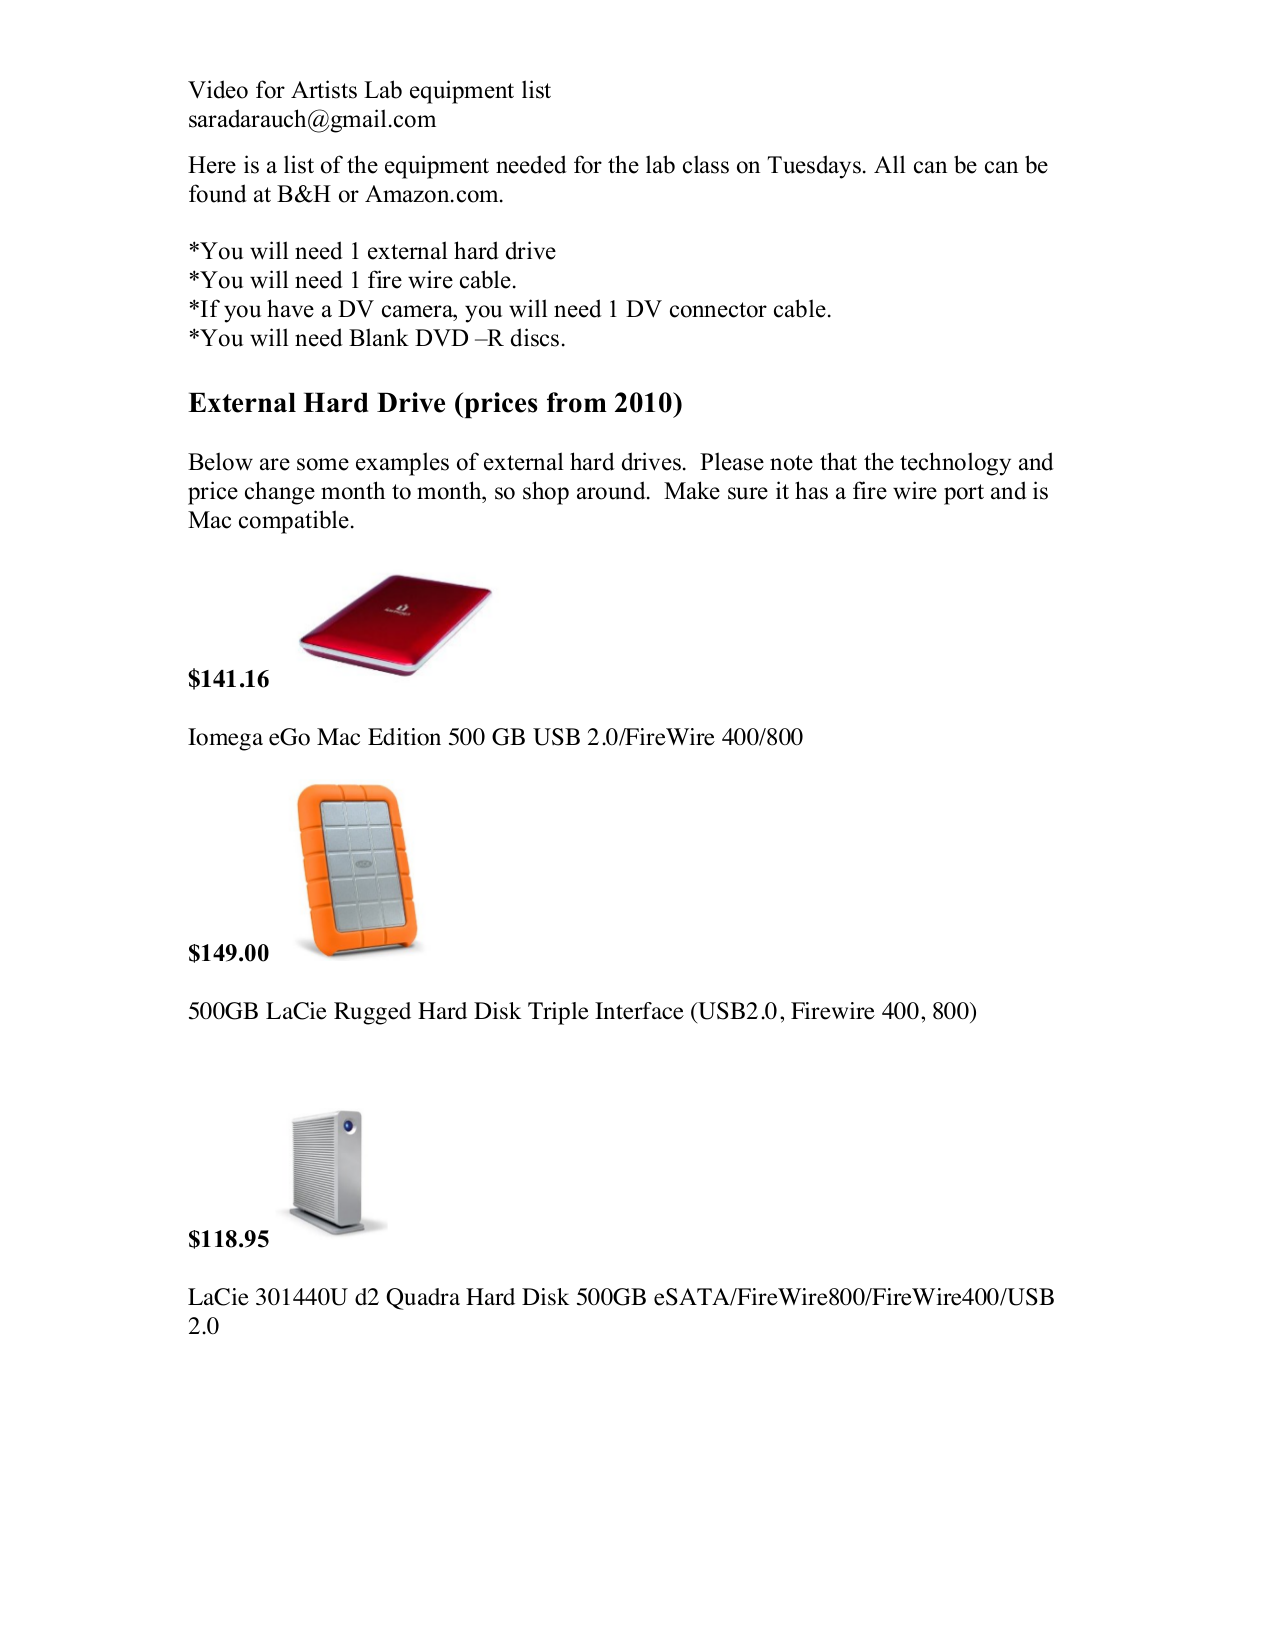 pdf for LaCie Storage 301440U manual